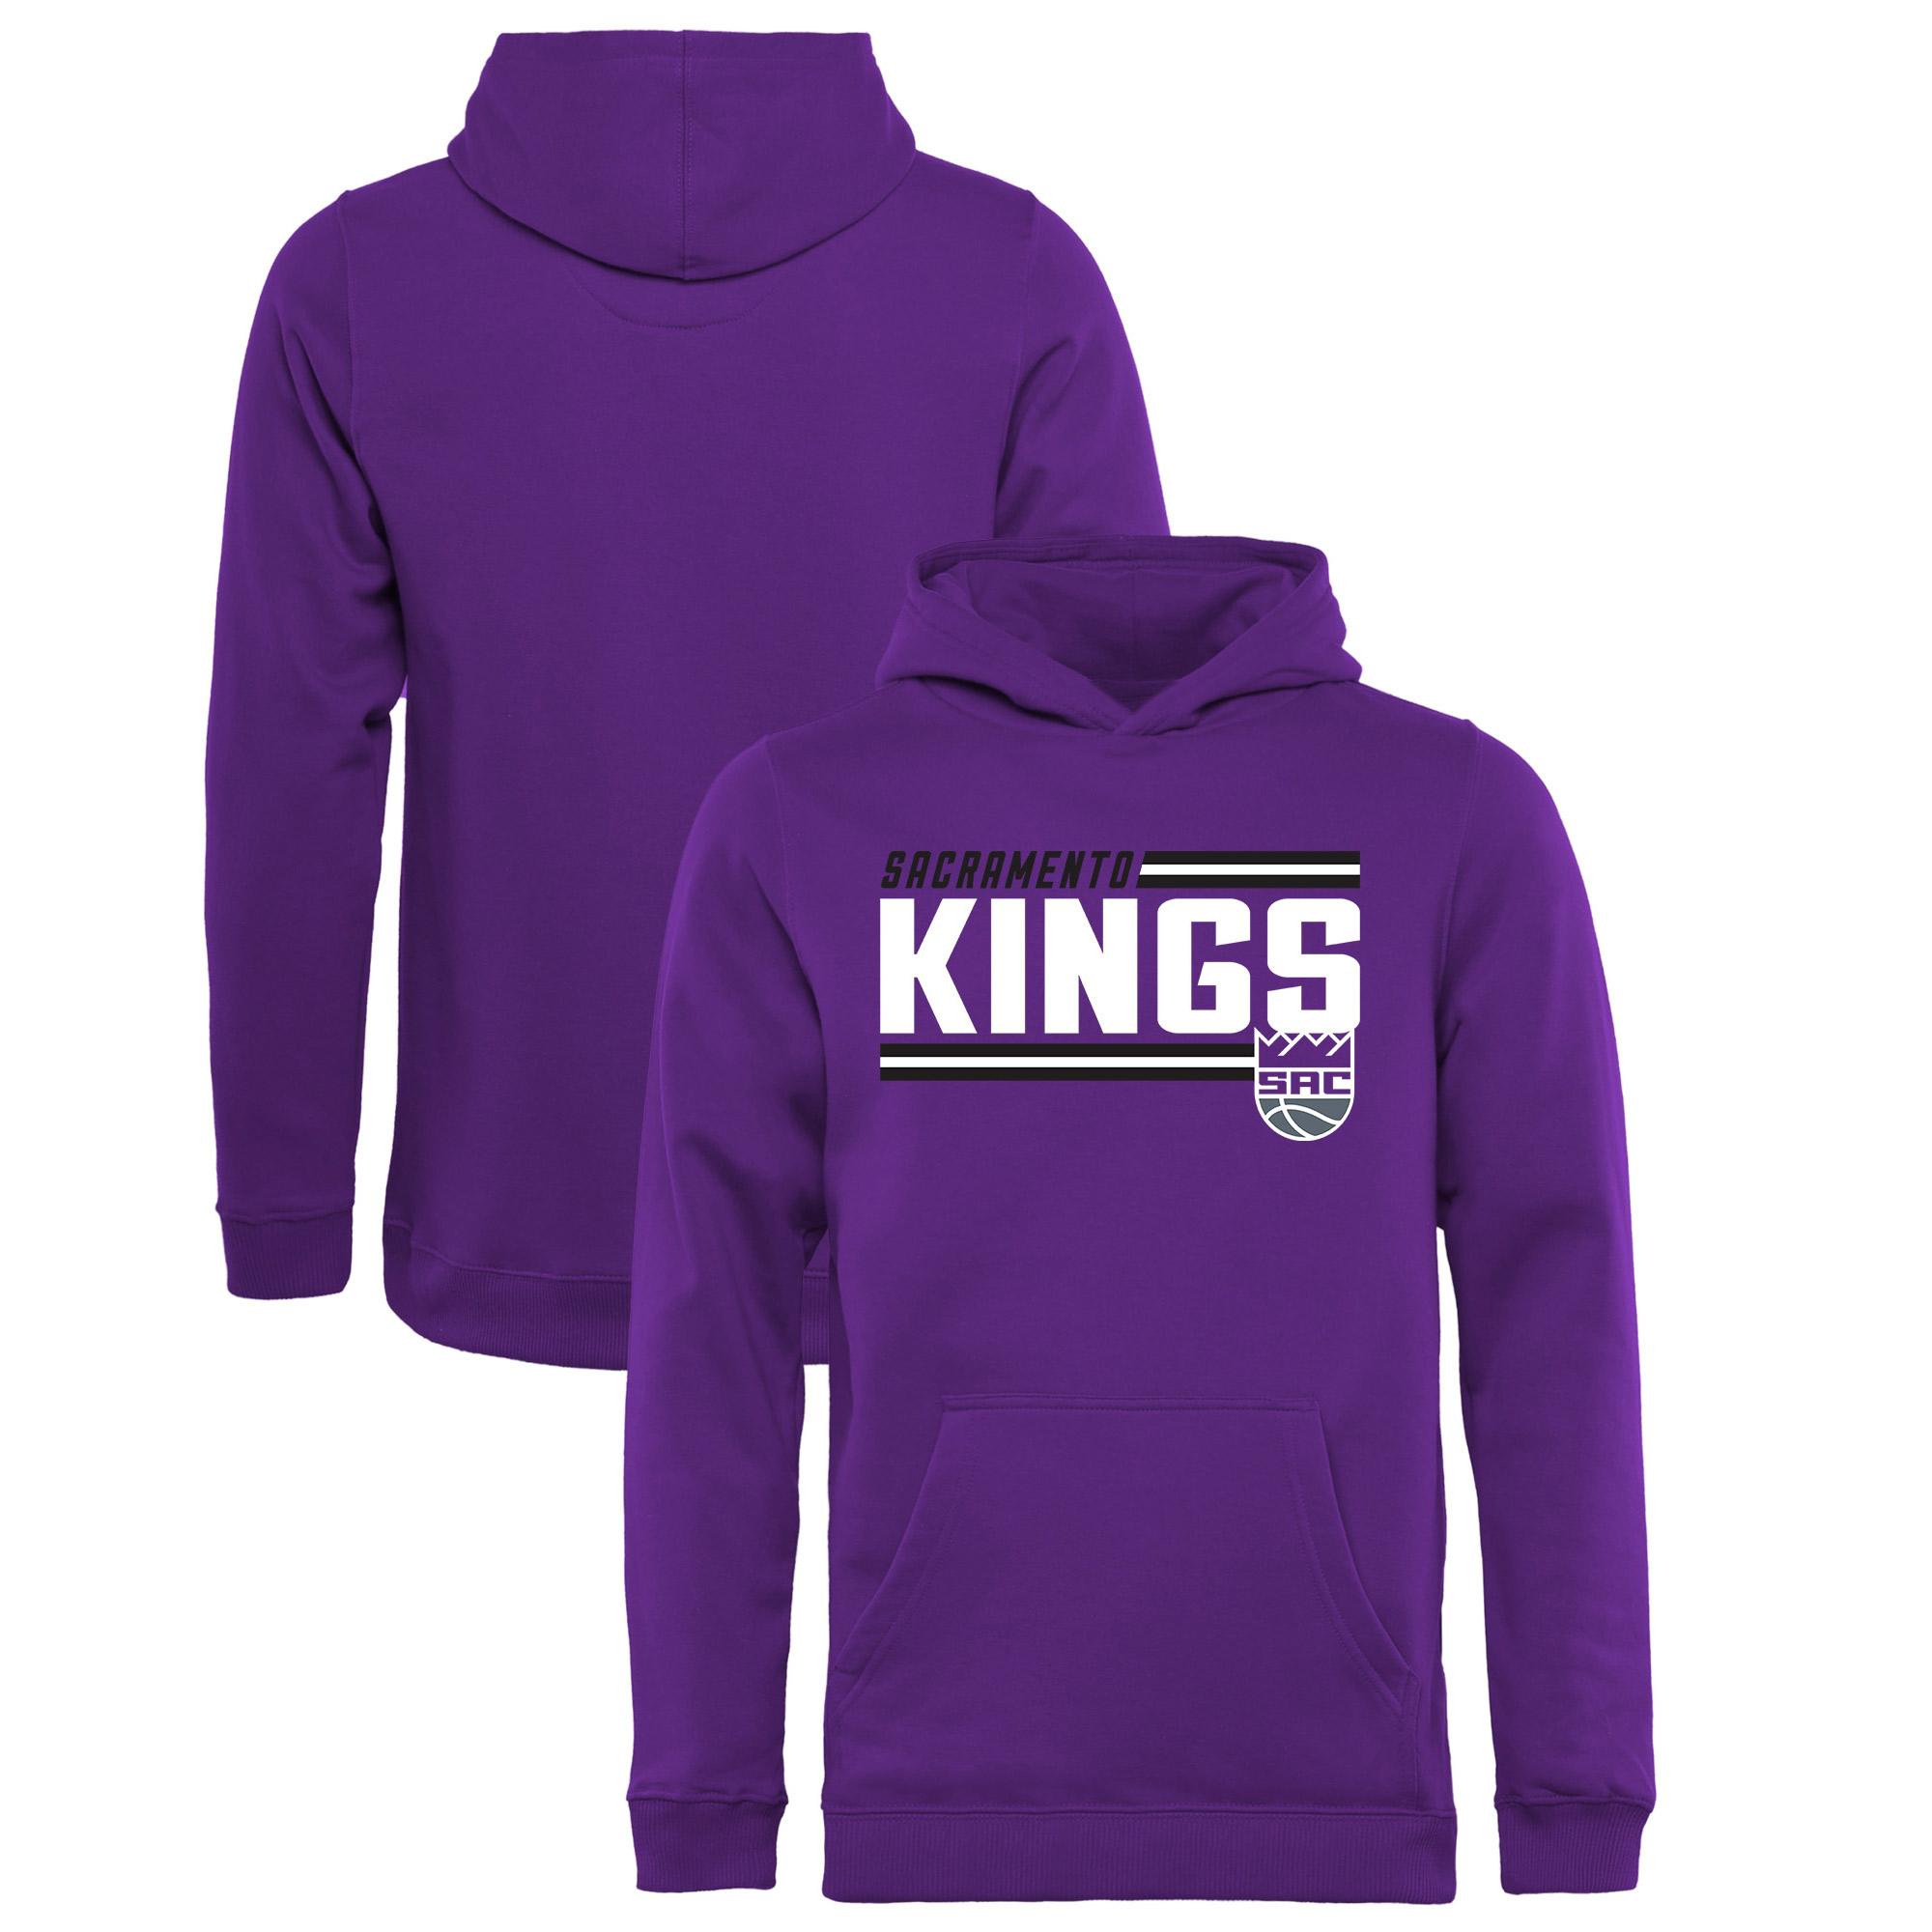 Sacramento Kings Fanatics Branded Youth Onside Stripe Pullover Hoodie - Purple